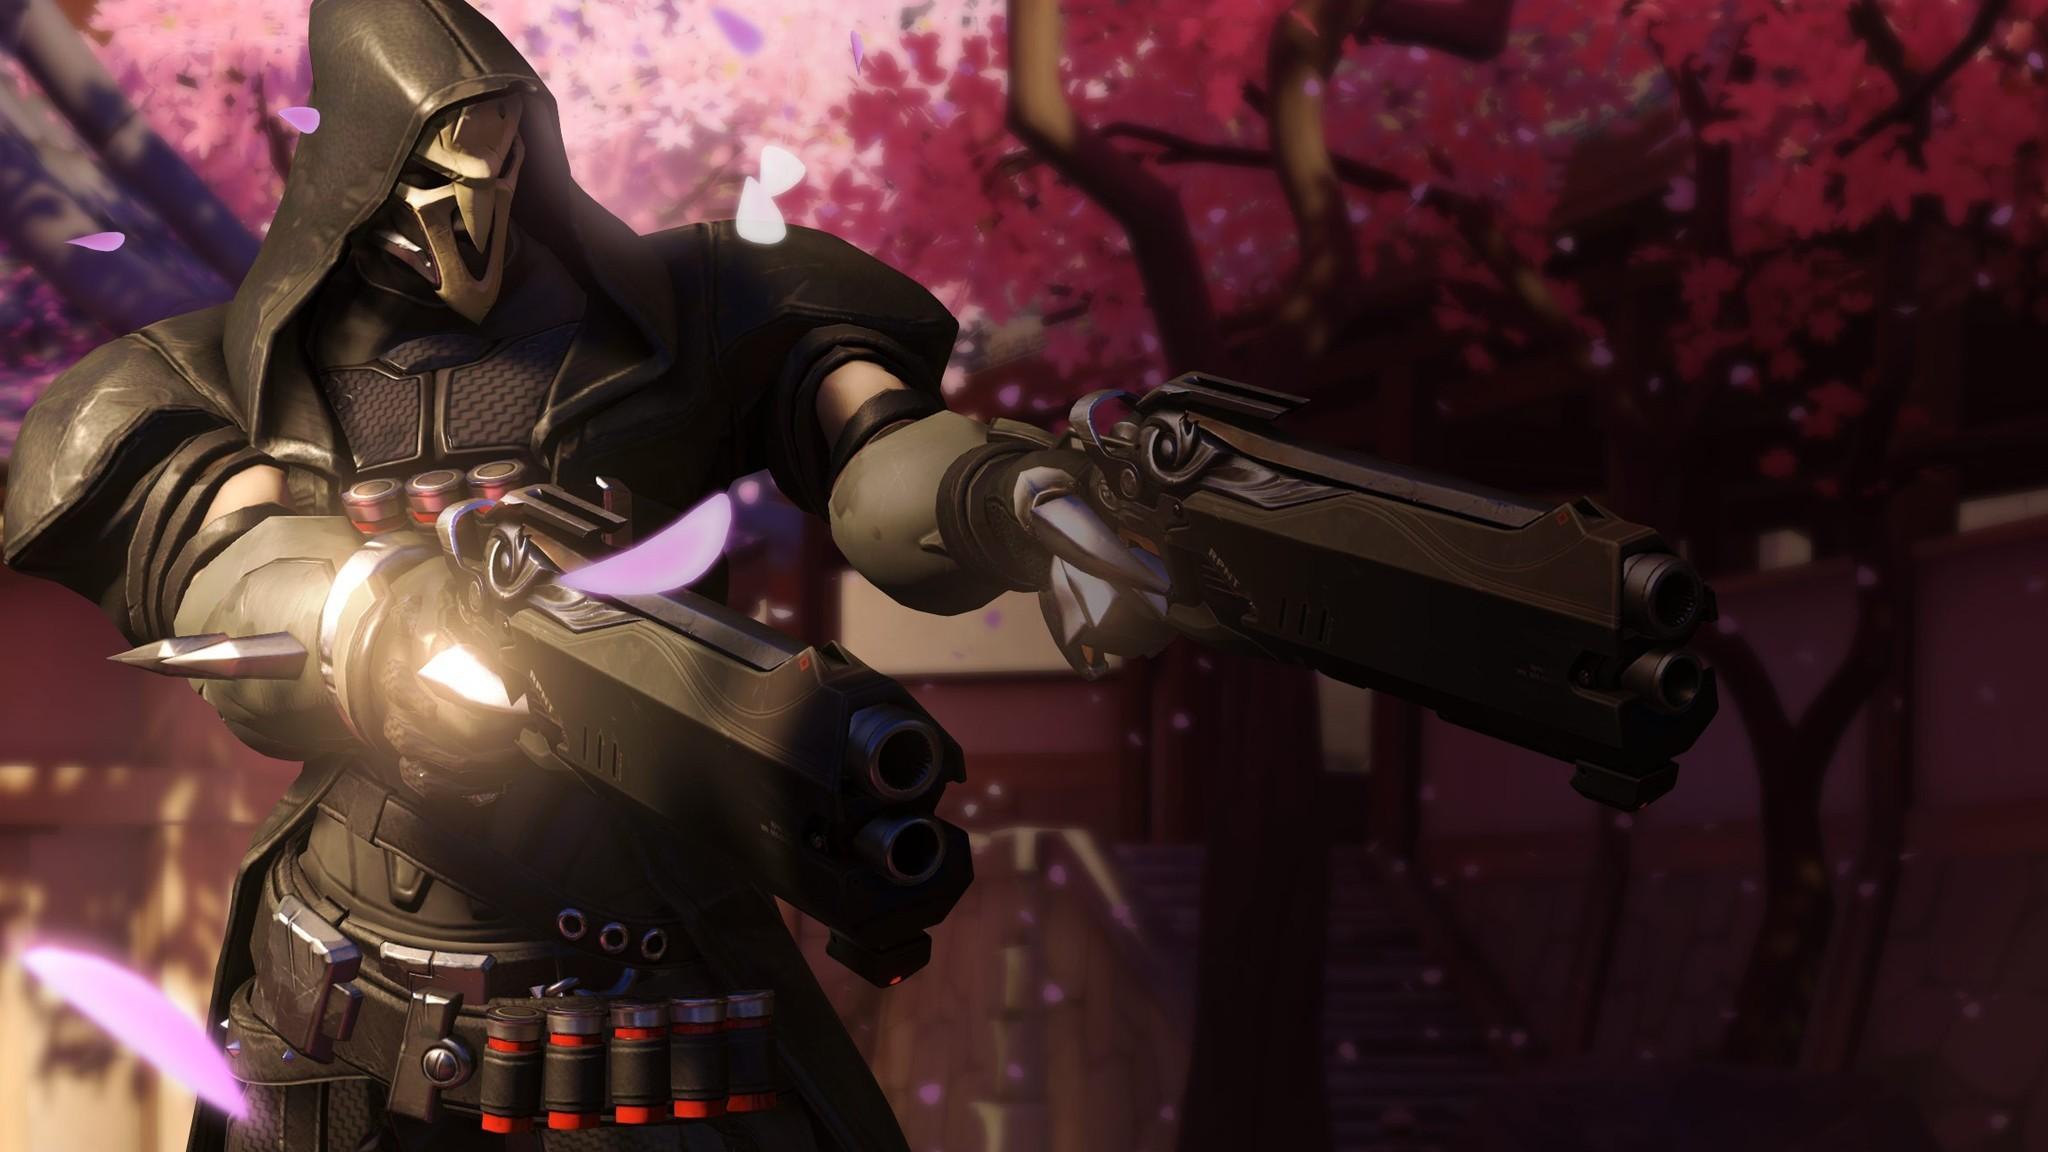 overwatch-game-wallpaper.jpg